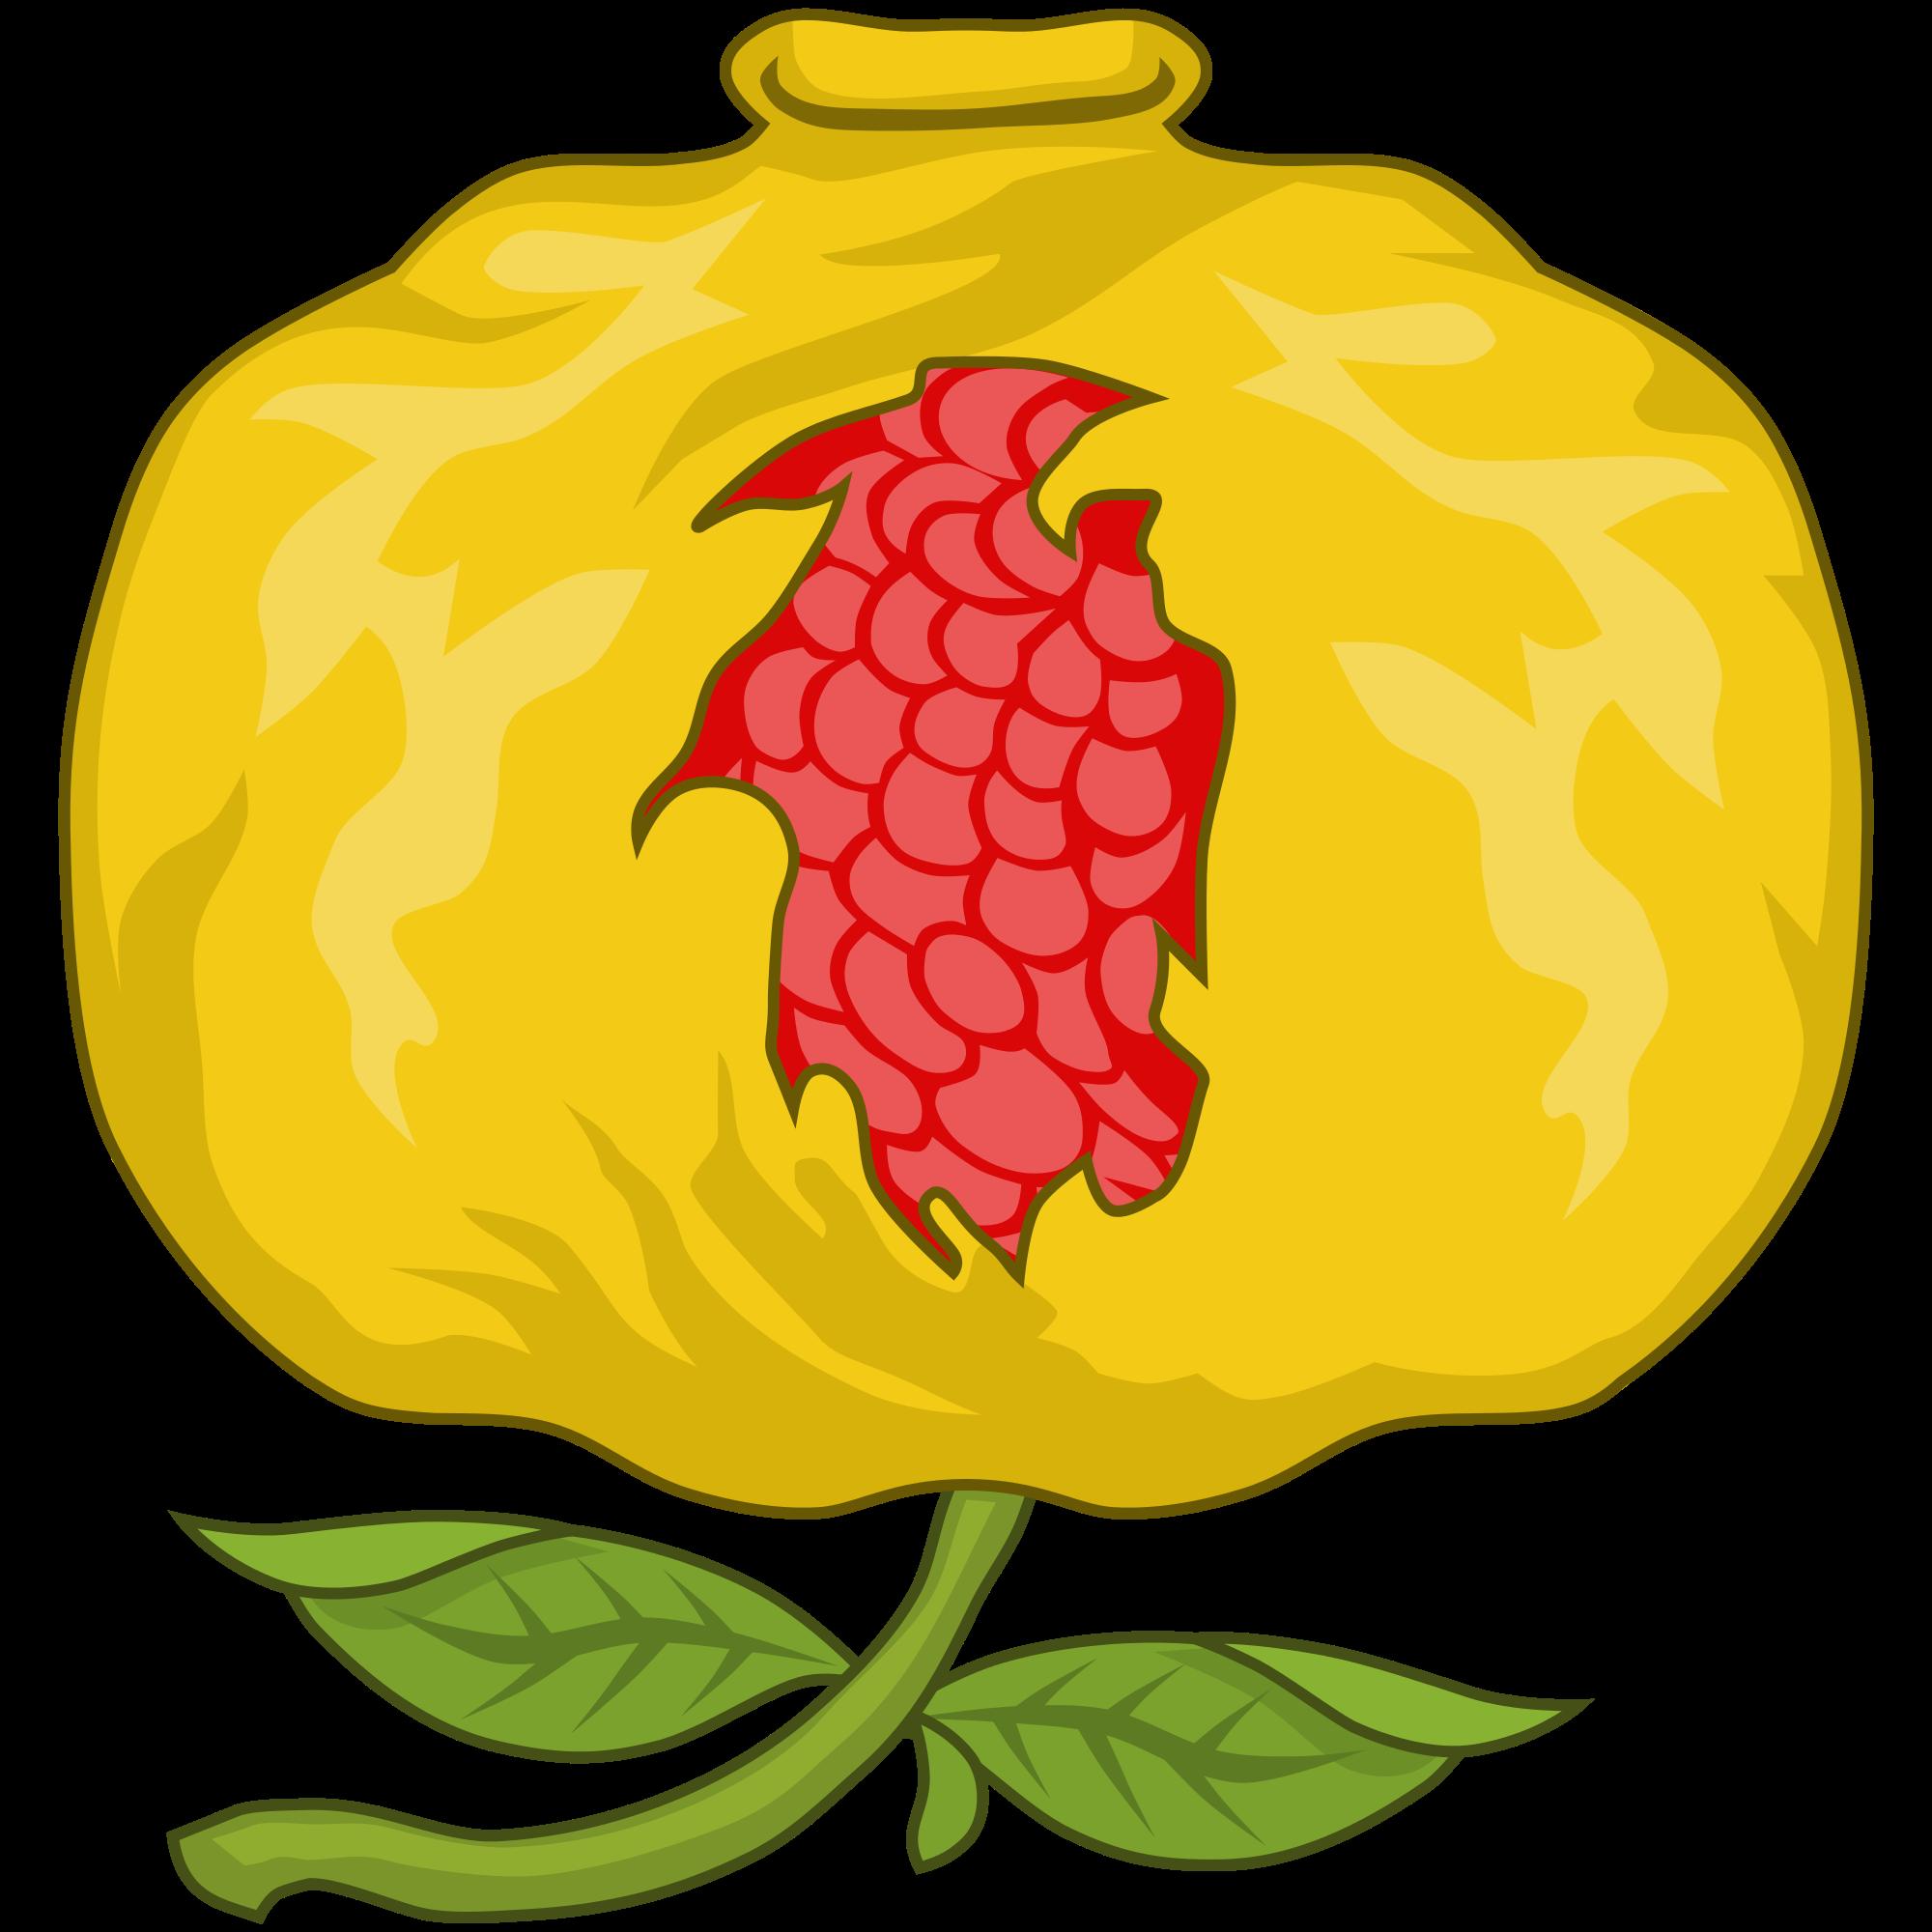 Pomegranate clipart file. Badge of mary i